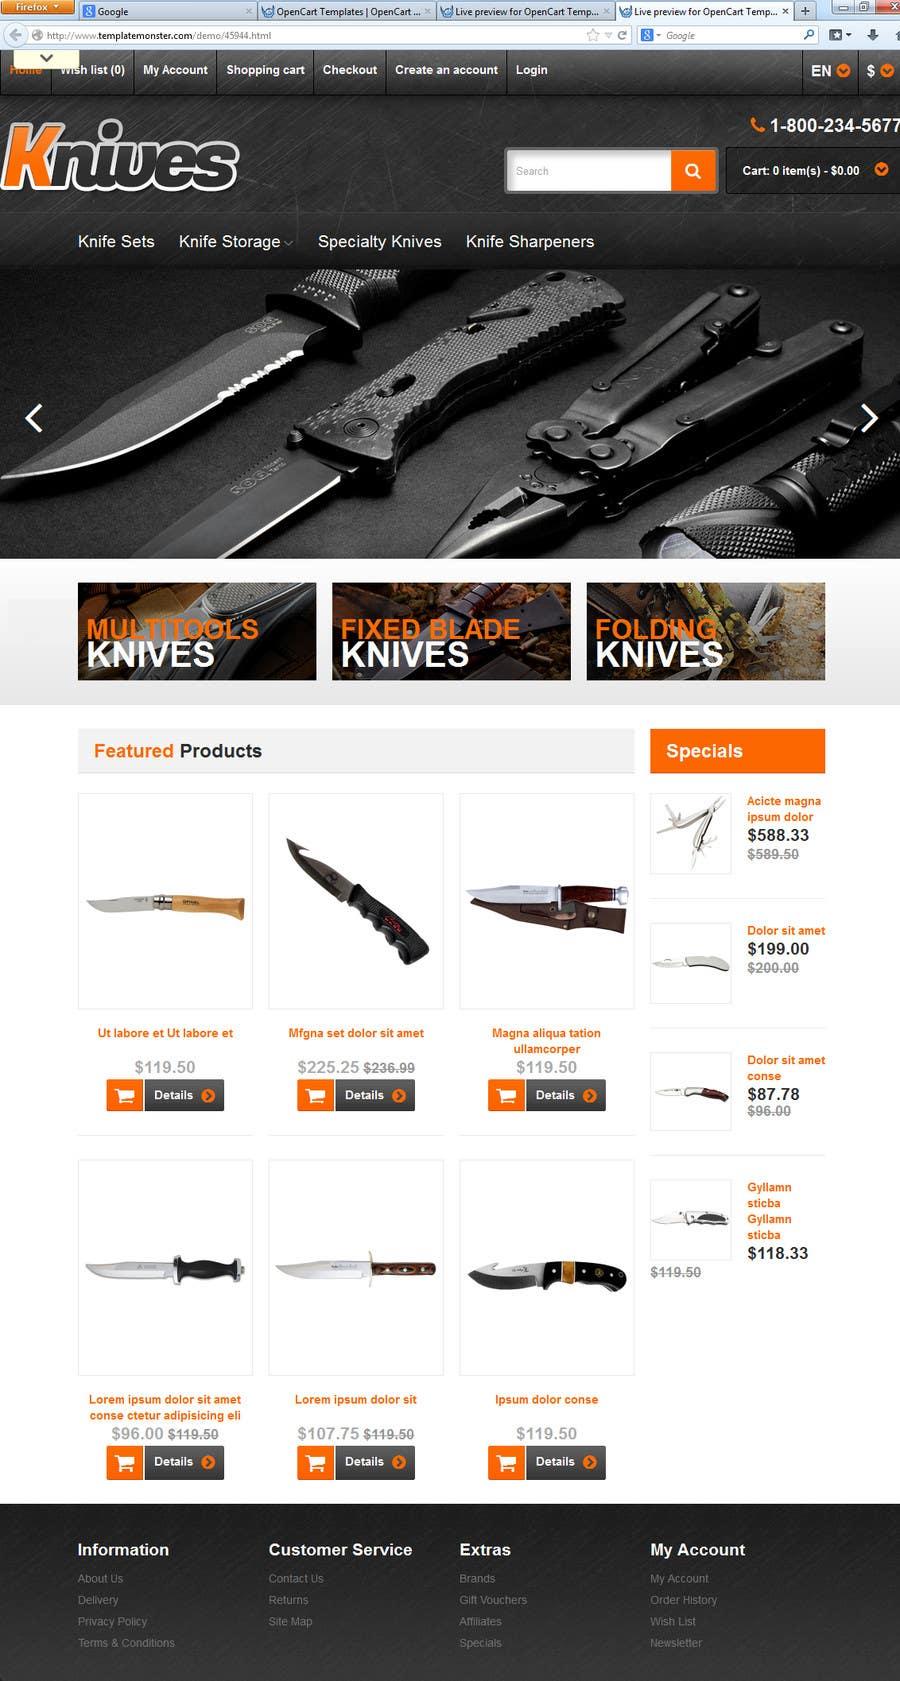 Inscrição nº 3 do Concurso para Build an Online Store for Spare Parts used in agriculture